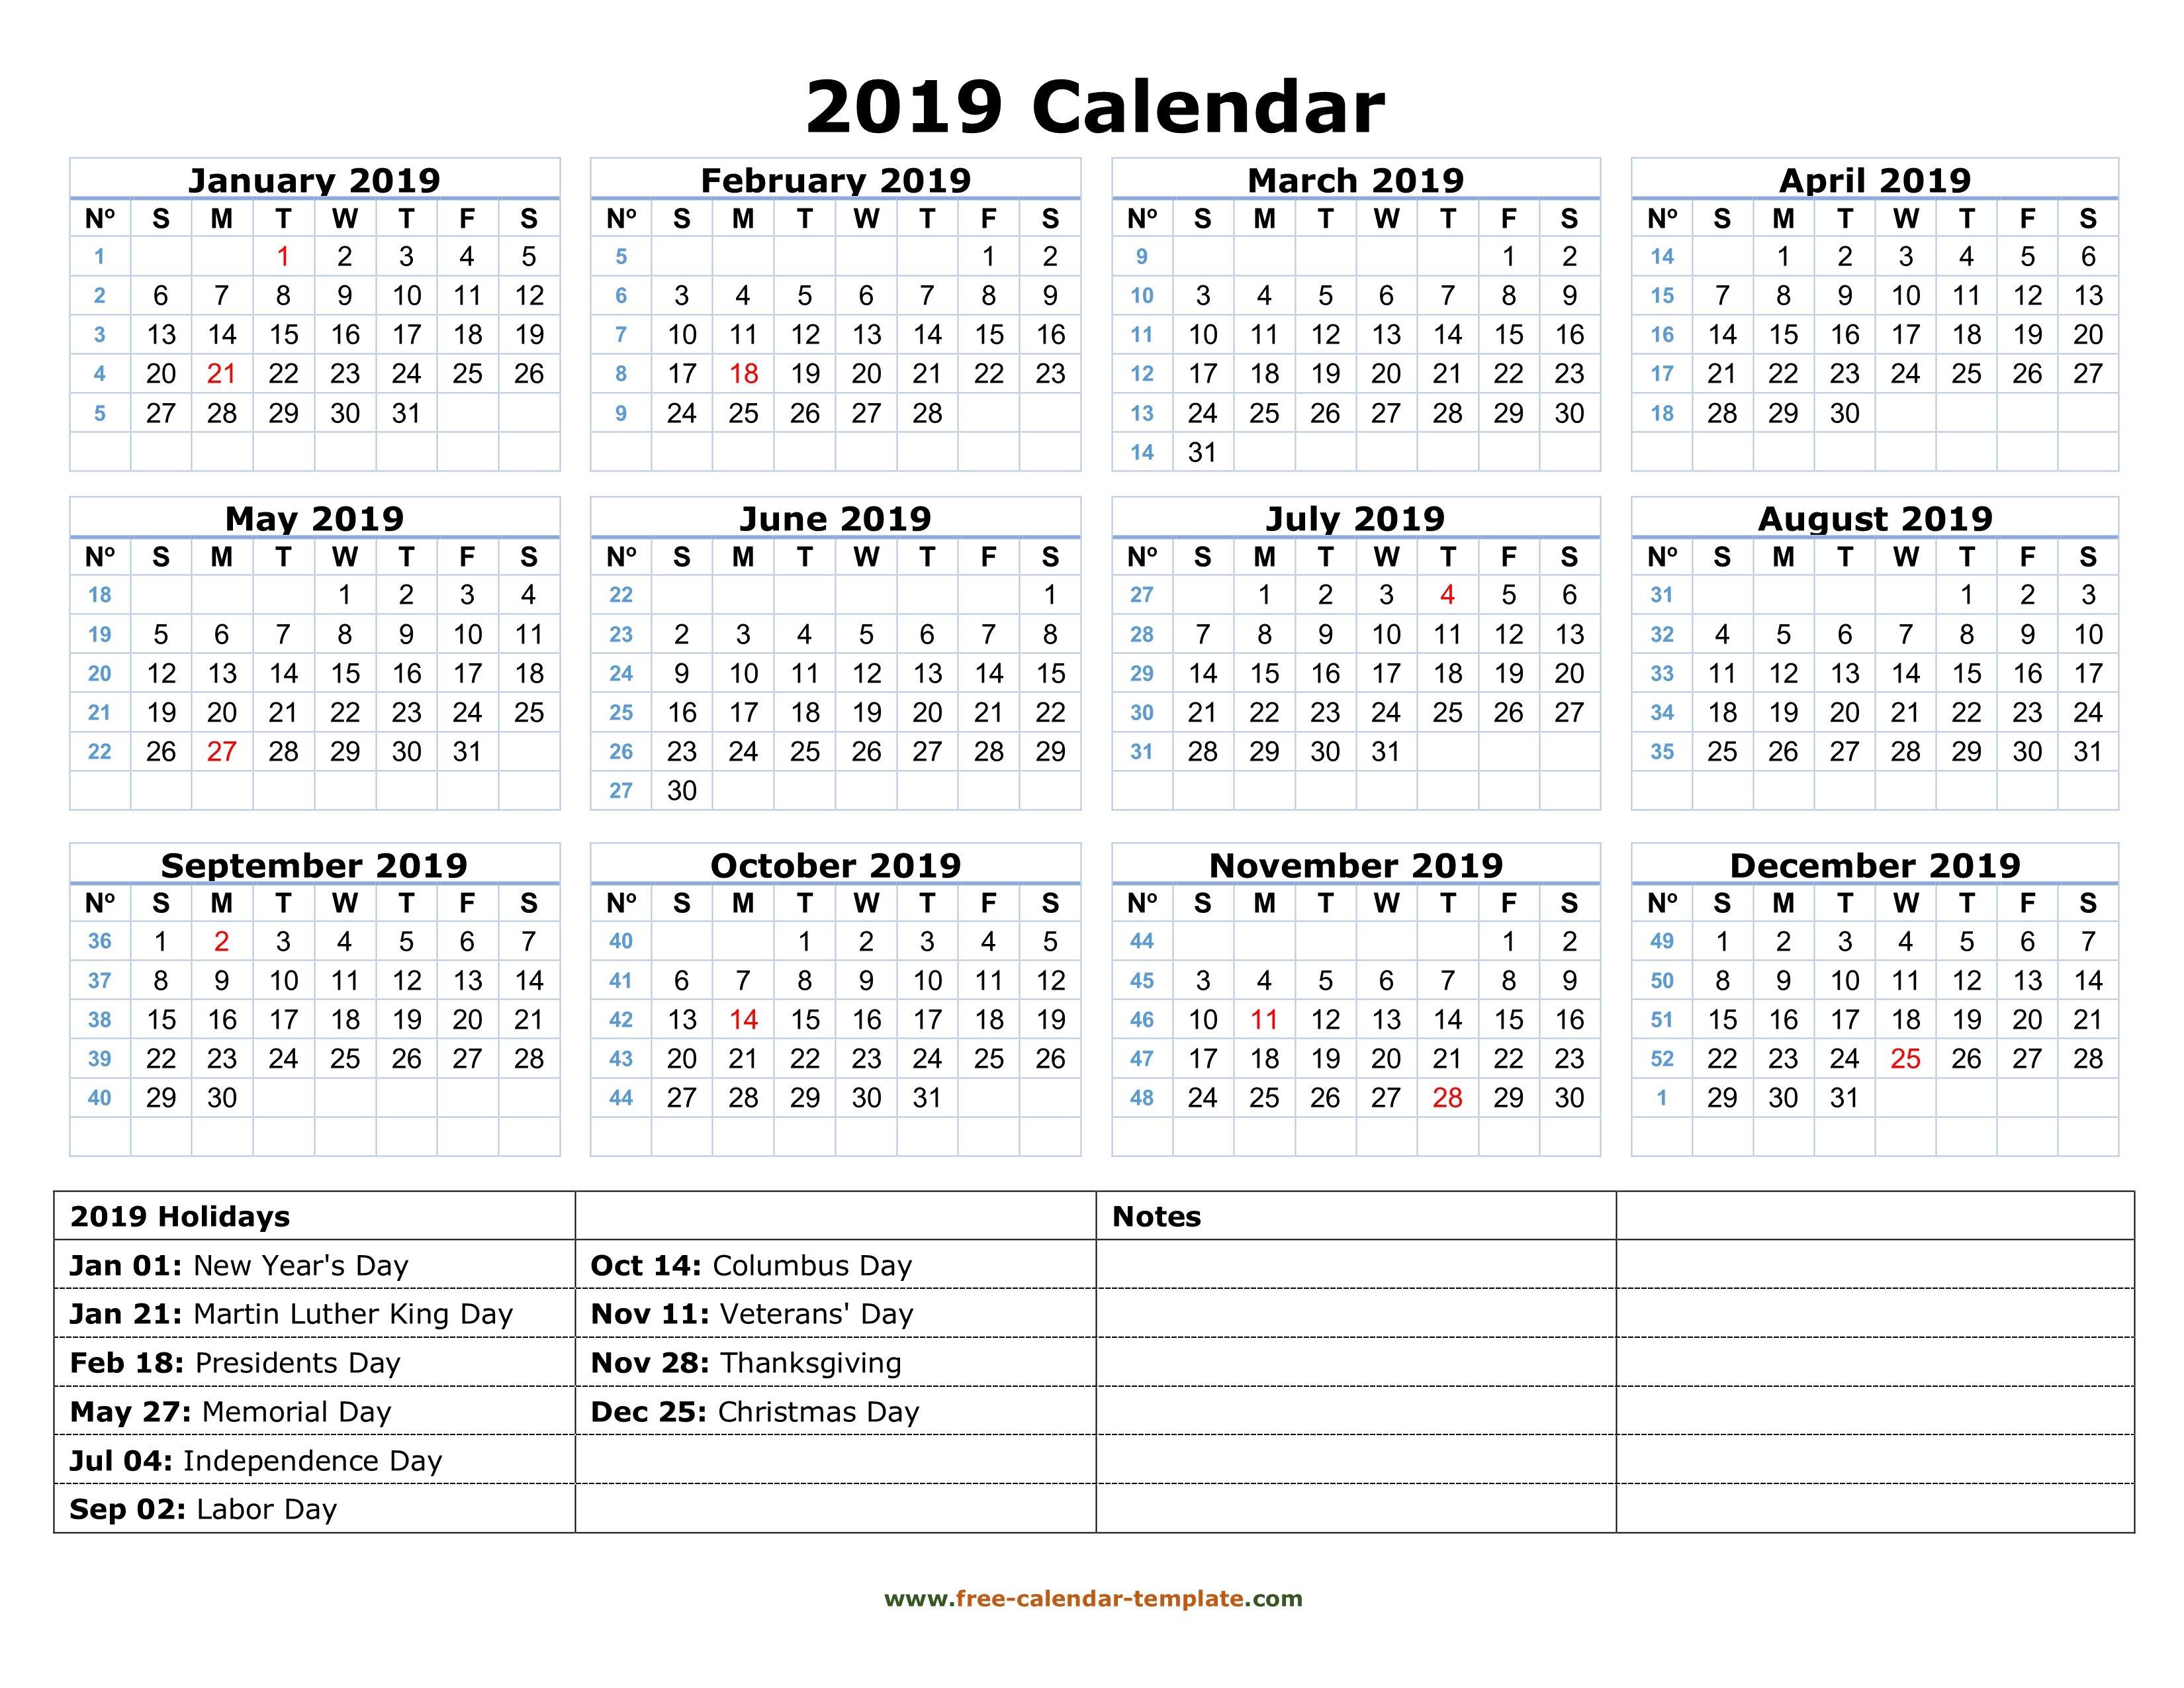 Printable Yearly Calendar 2019 With Us Holidays | Free-Calendar Calendar 2019 View